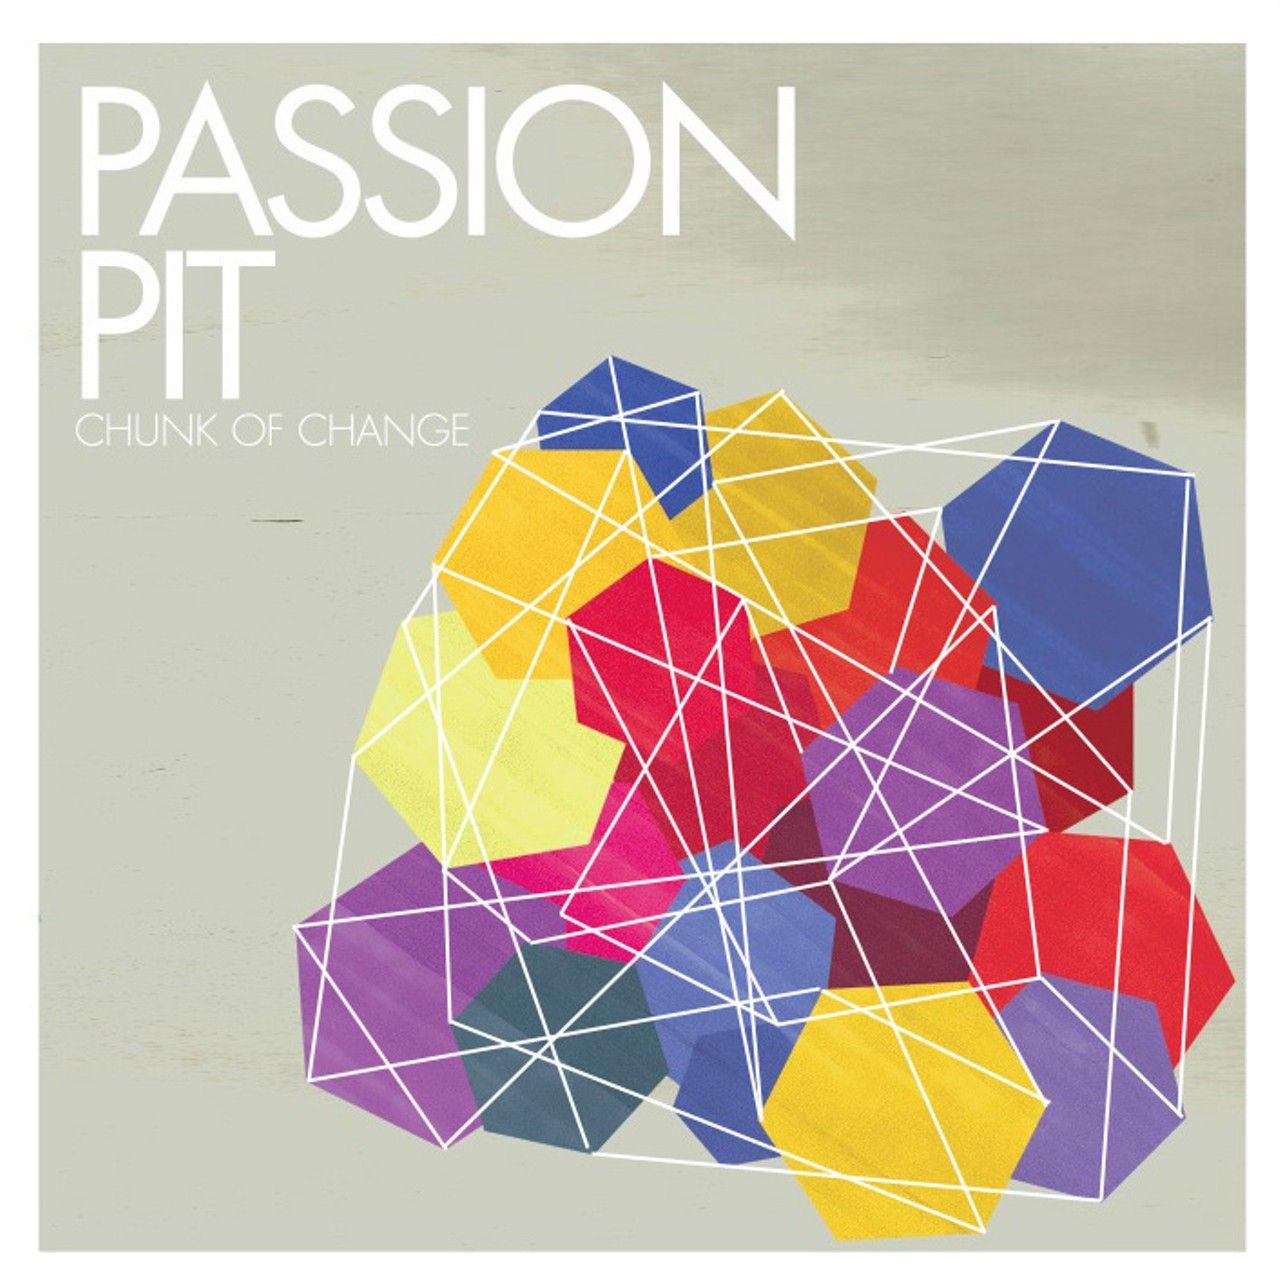 passion_pit_-_chunk_of_change.jpg (1280×1278)